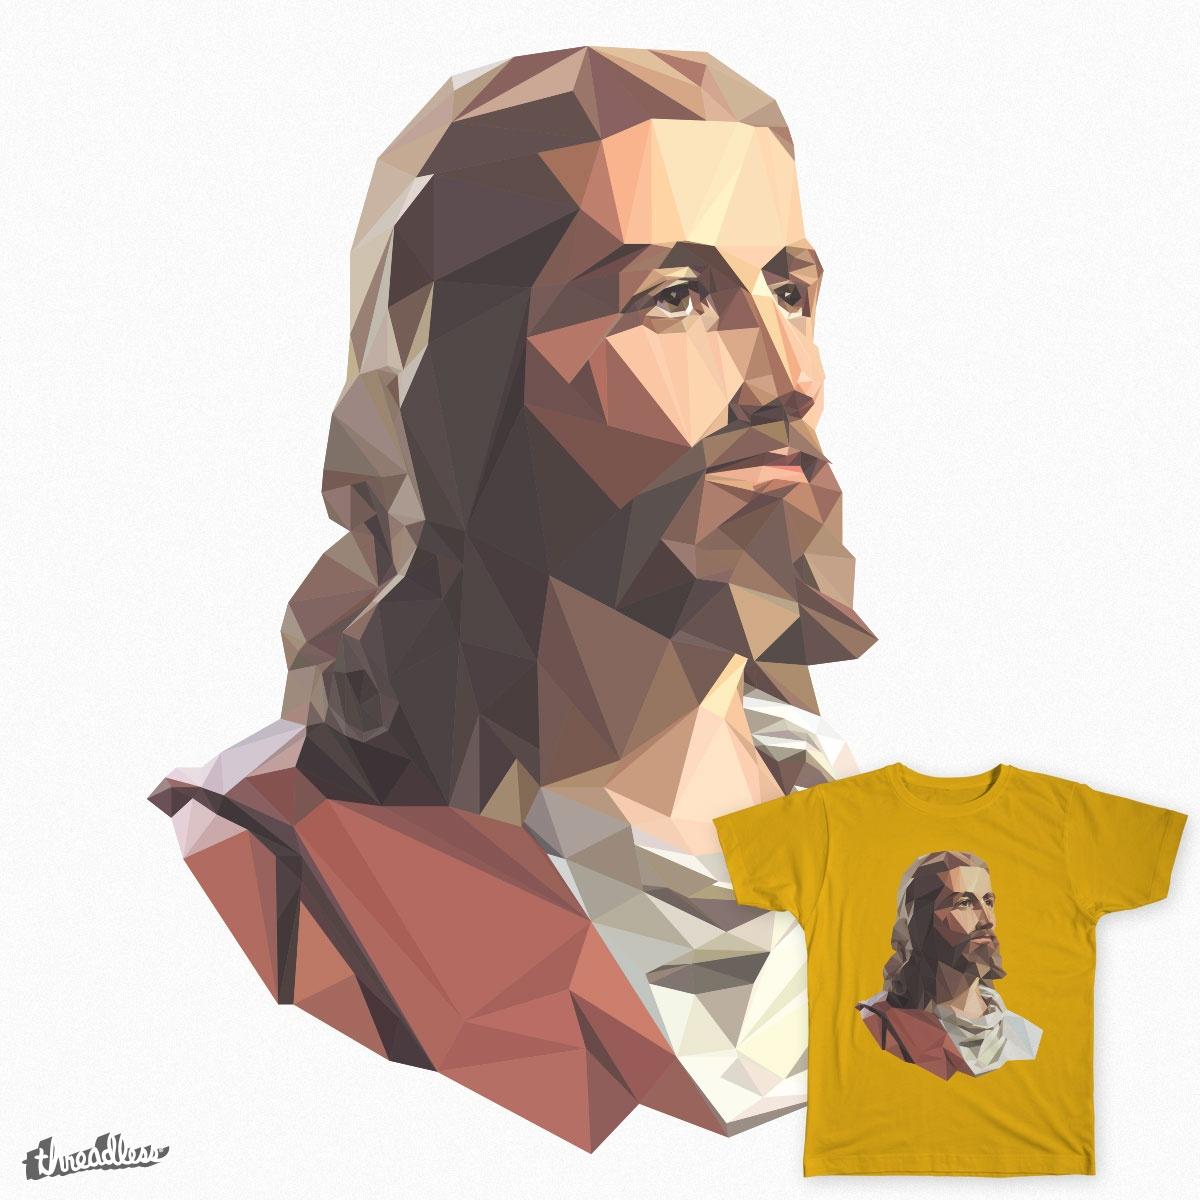 Low Poly Jesus by ryanperkins on Threadless